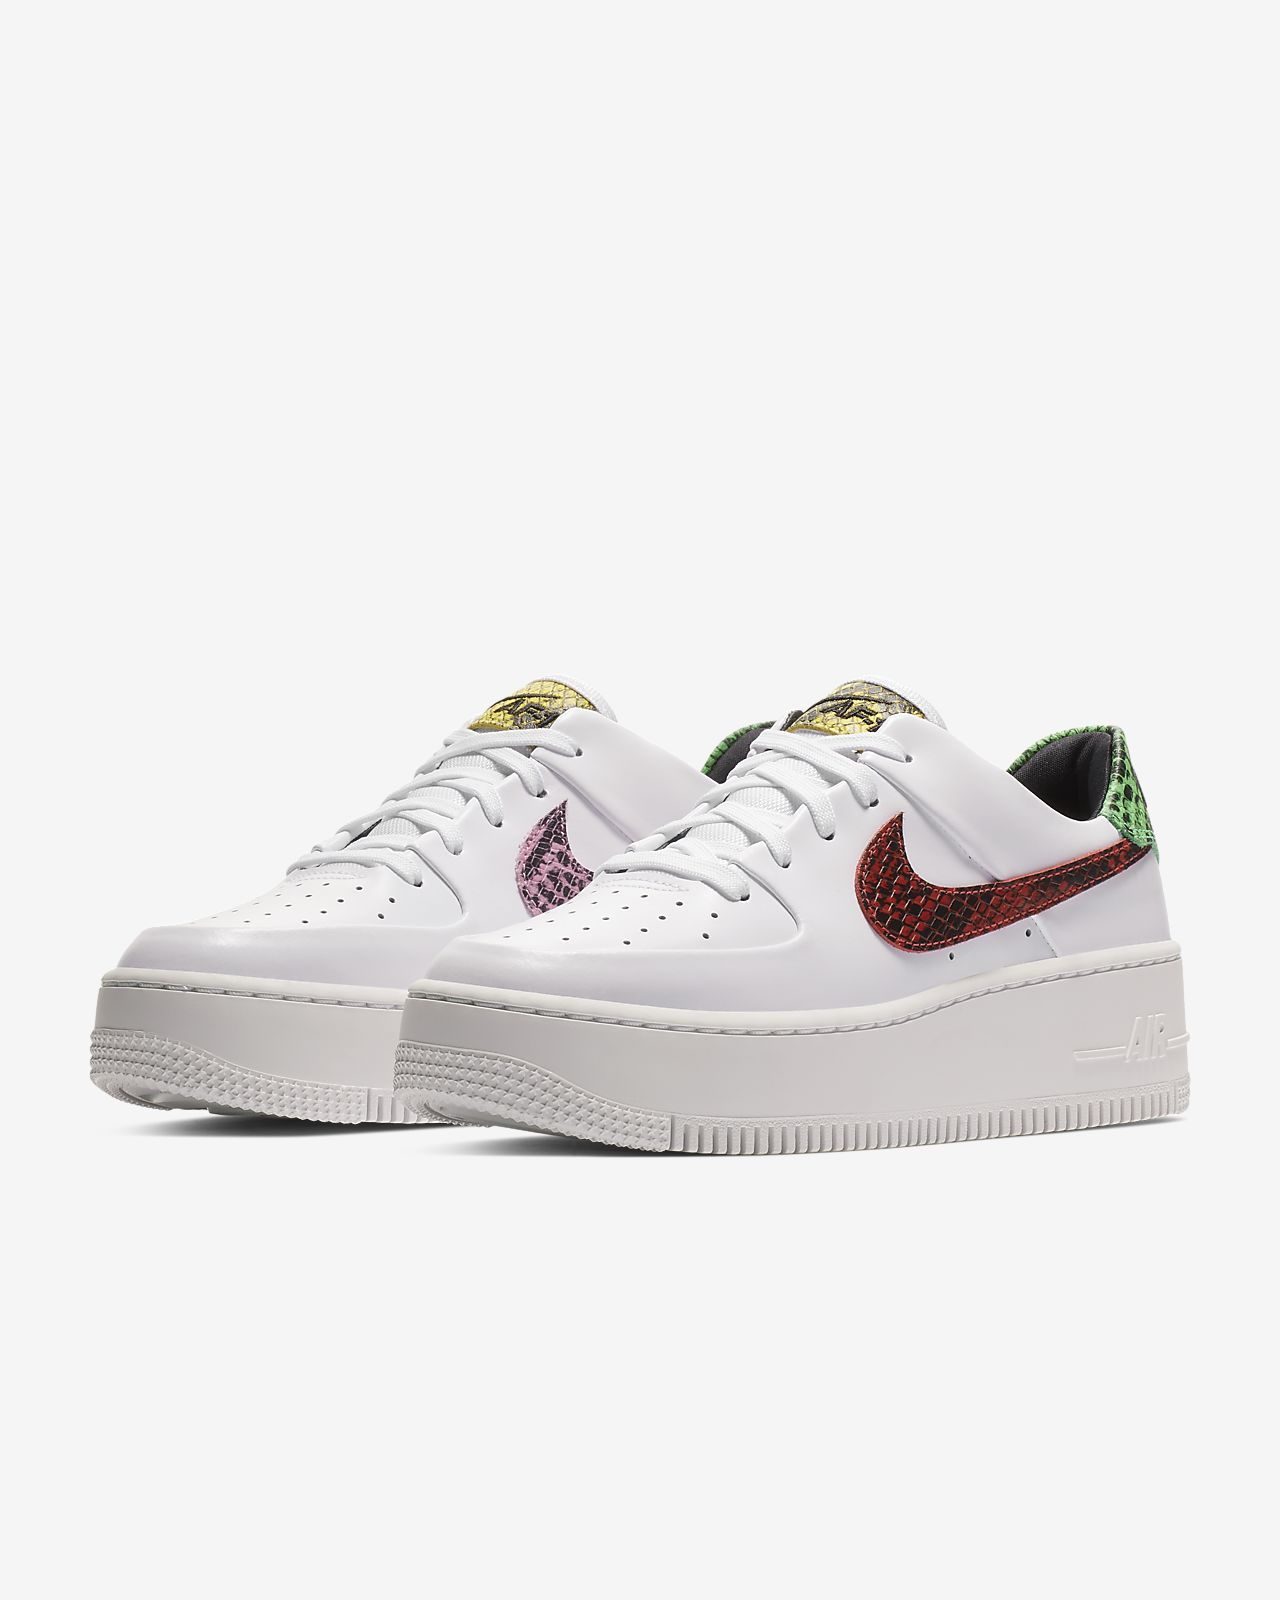 753ce208004e26 Nike Air Force 1 Sage Low Premium Animal Women s Shoe. Nike.com GB